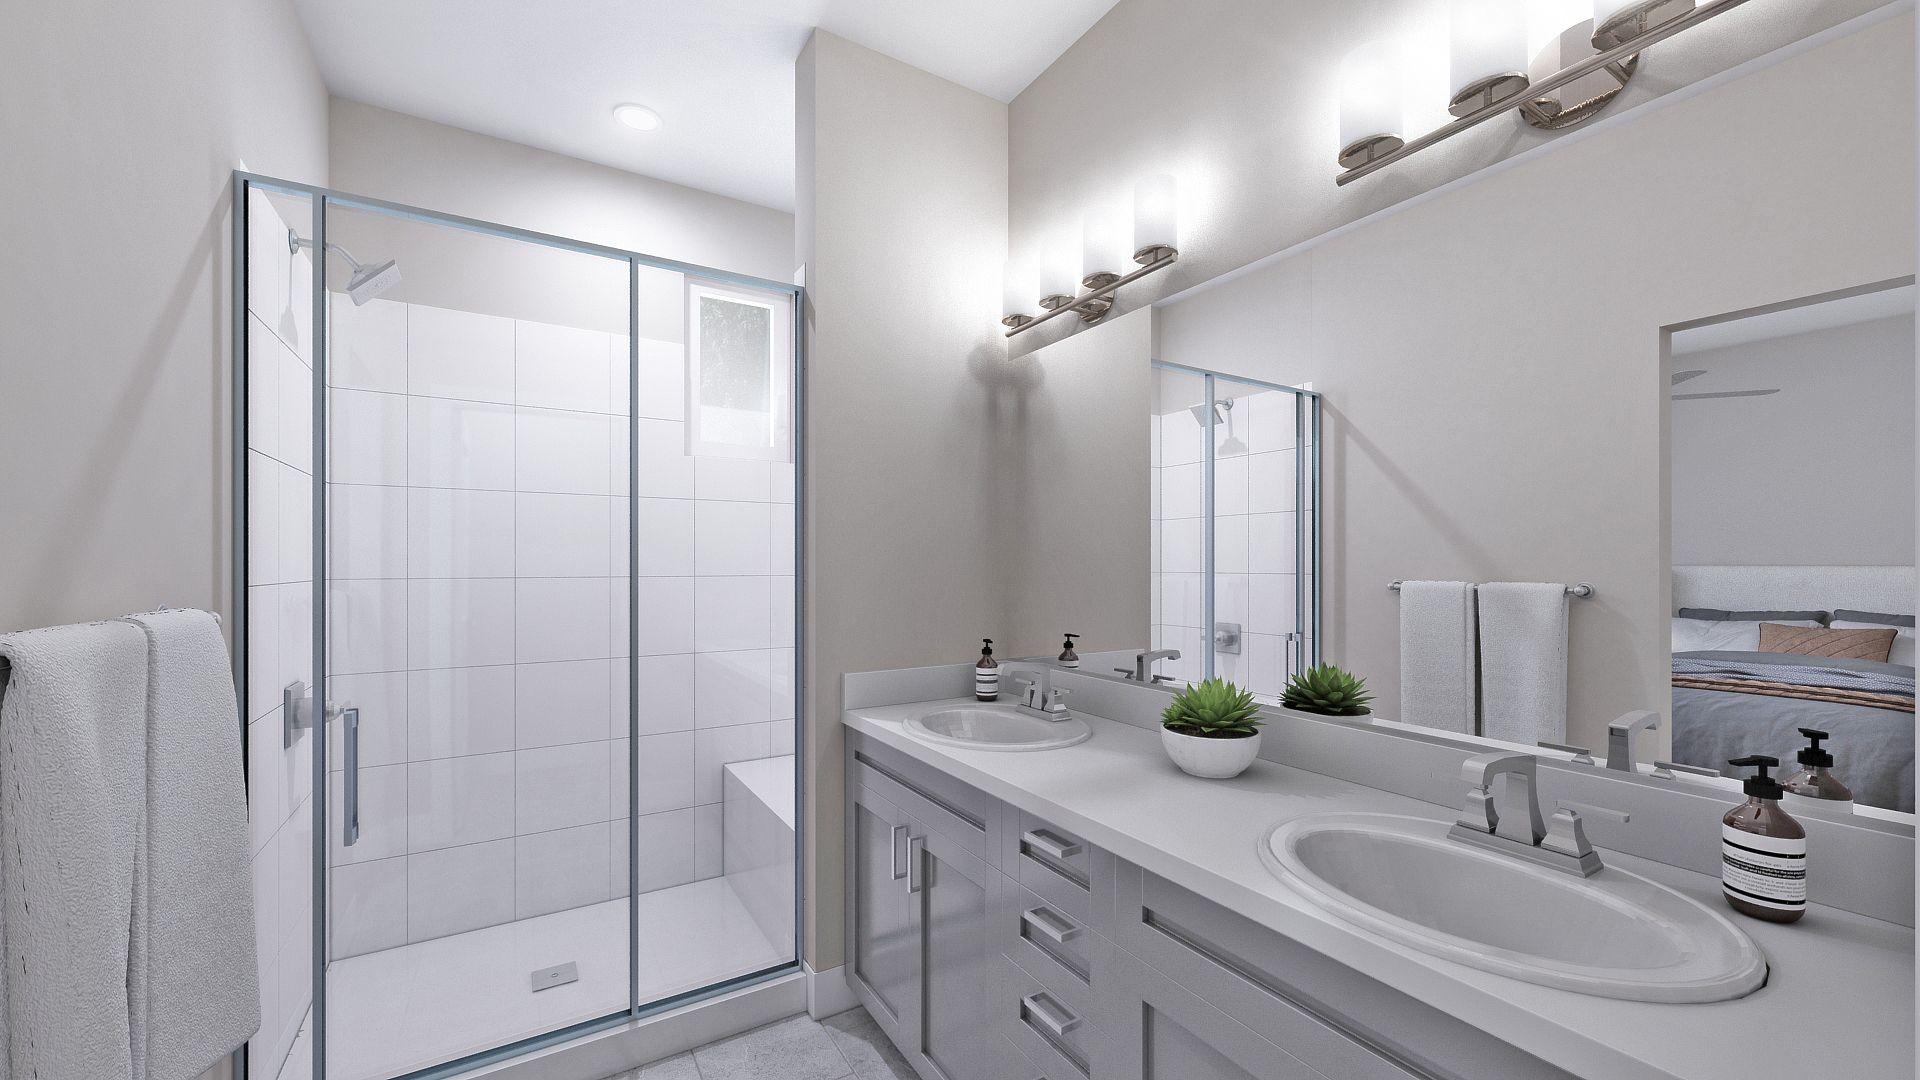 Bathroom featured in the B Plan By Koelbel Urban Homes in Denver, CO